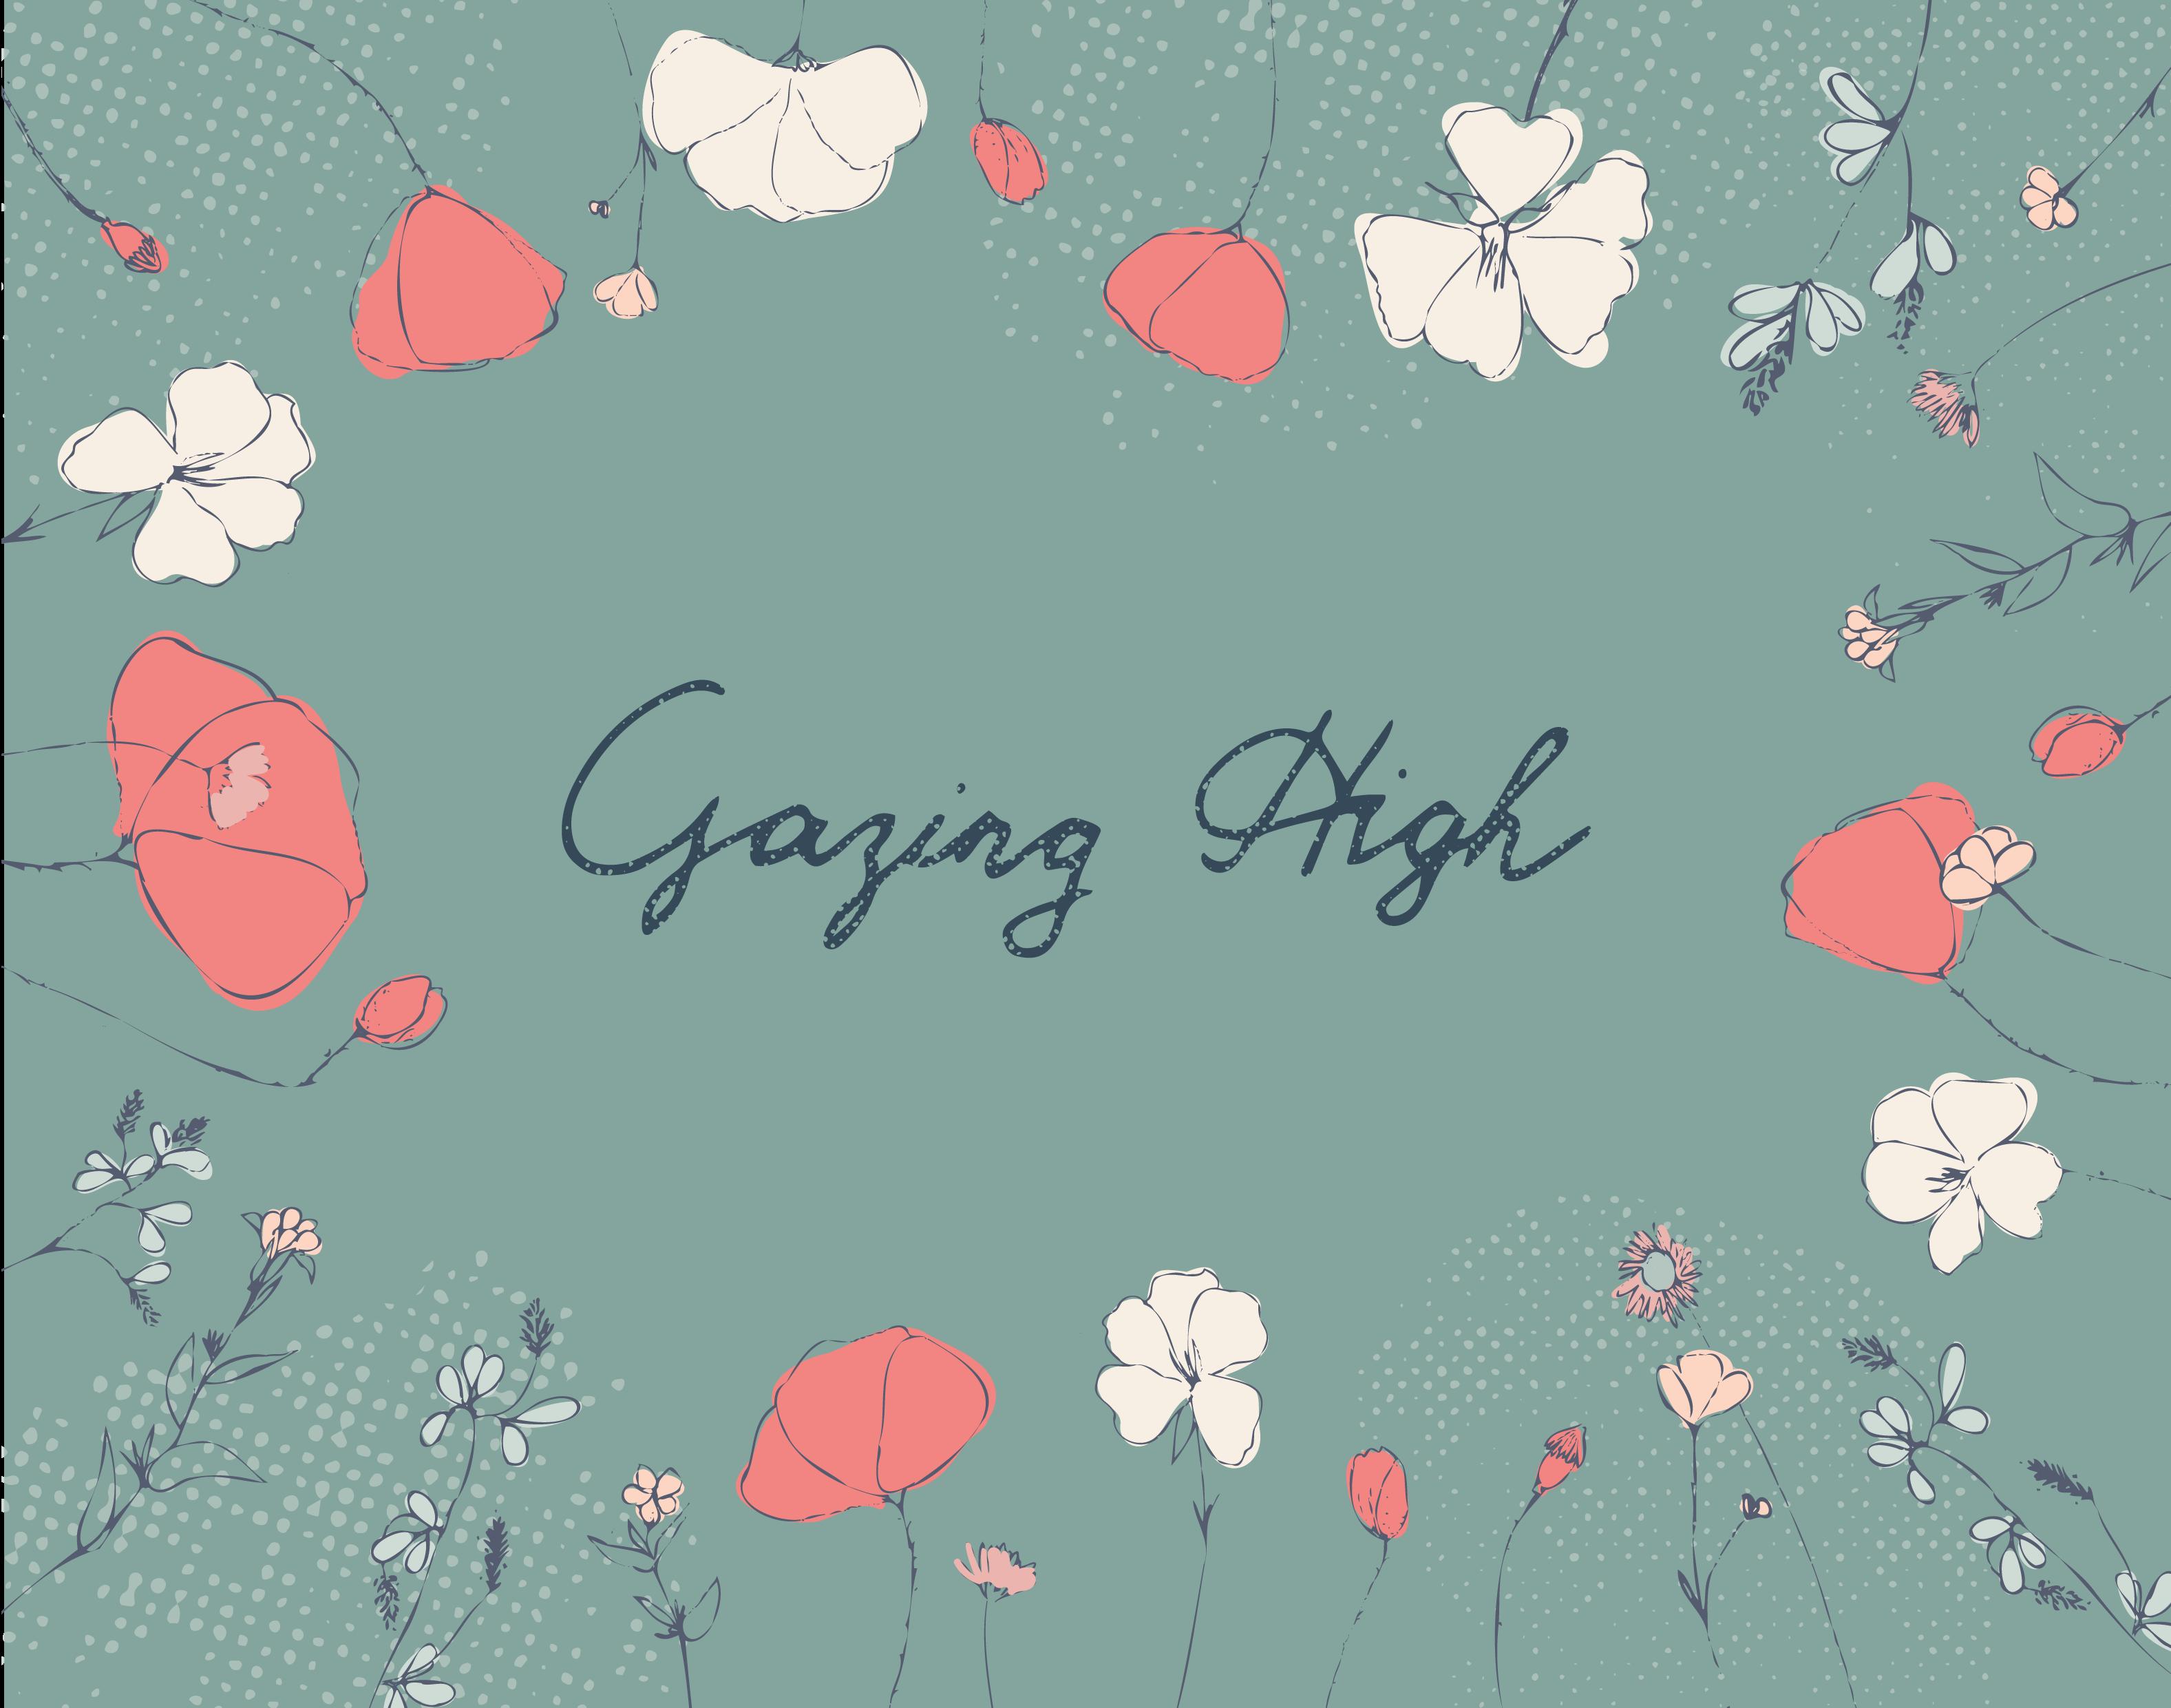 Gazing high